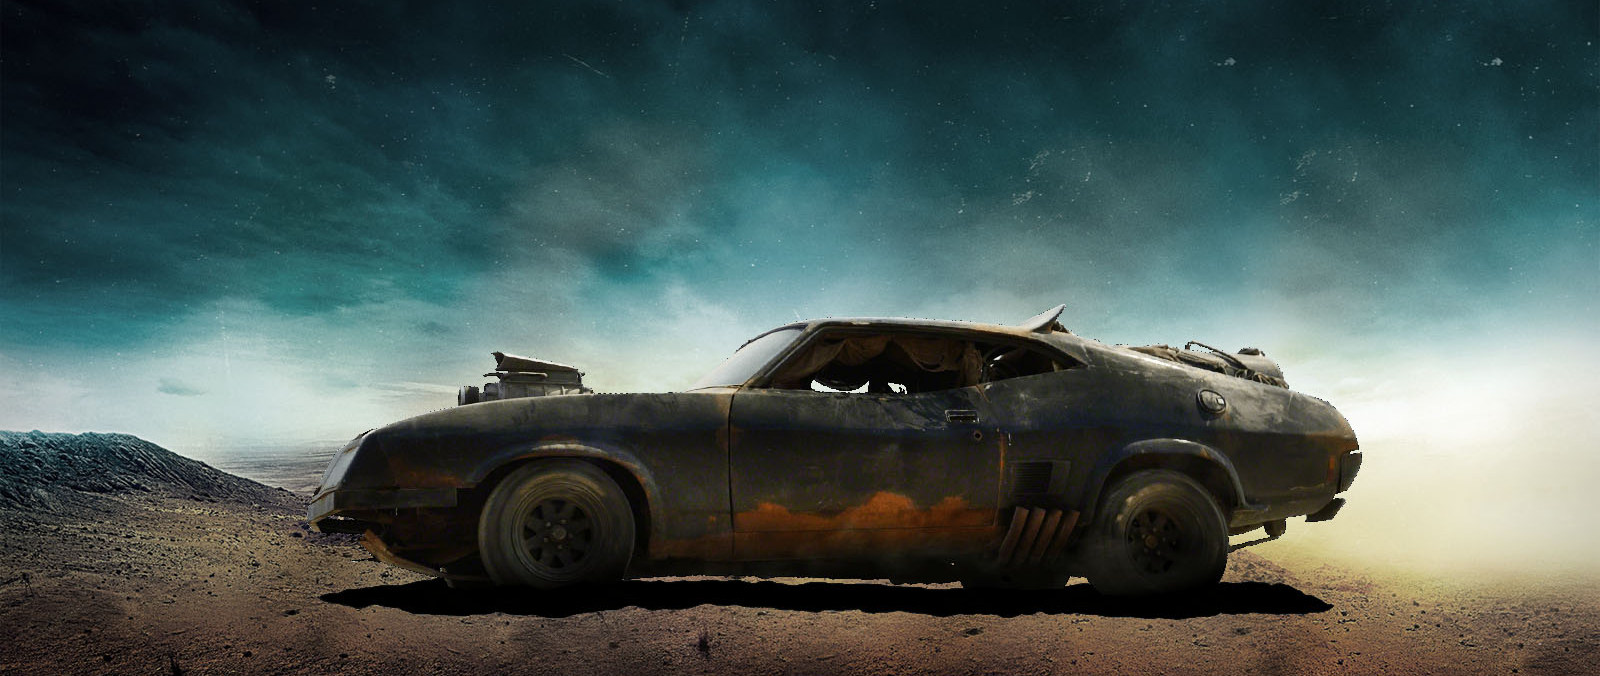 interceptor-mad-max-fury-road-cars-ford-falcon-xb-gt-coupe-1973-v8-muscle-car-max-rockatansky-vehicles